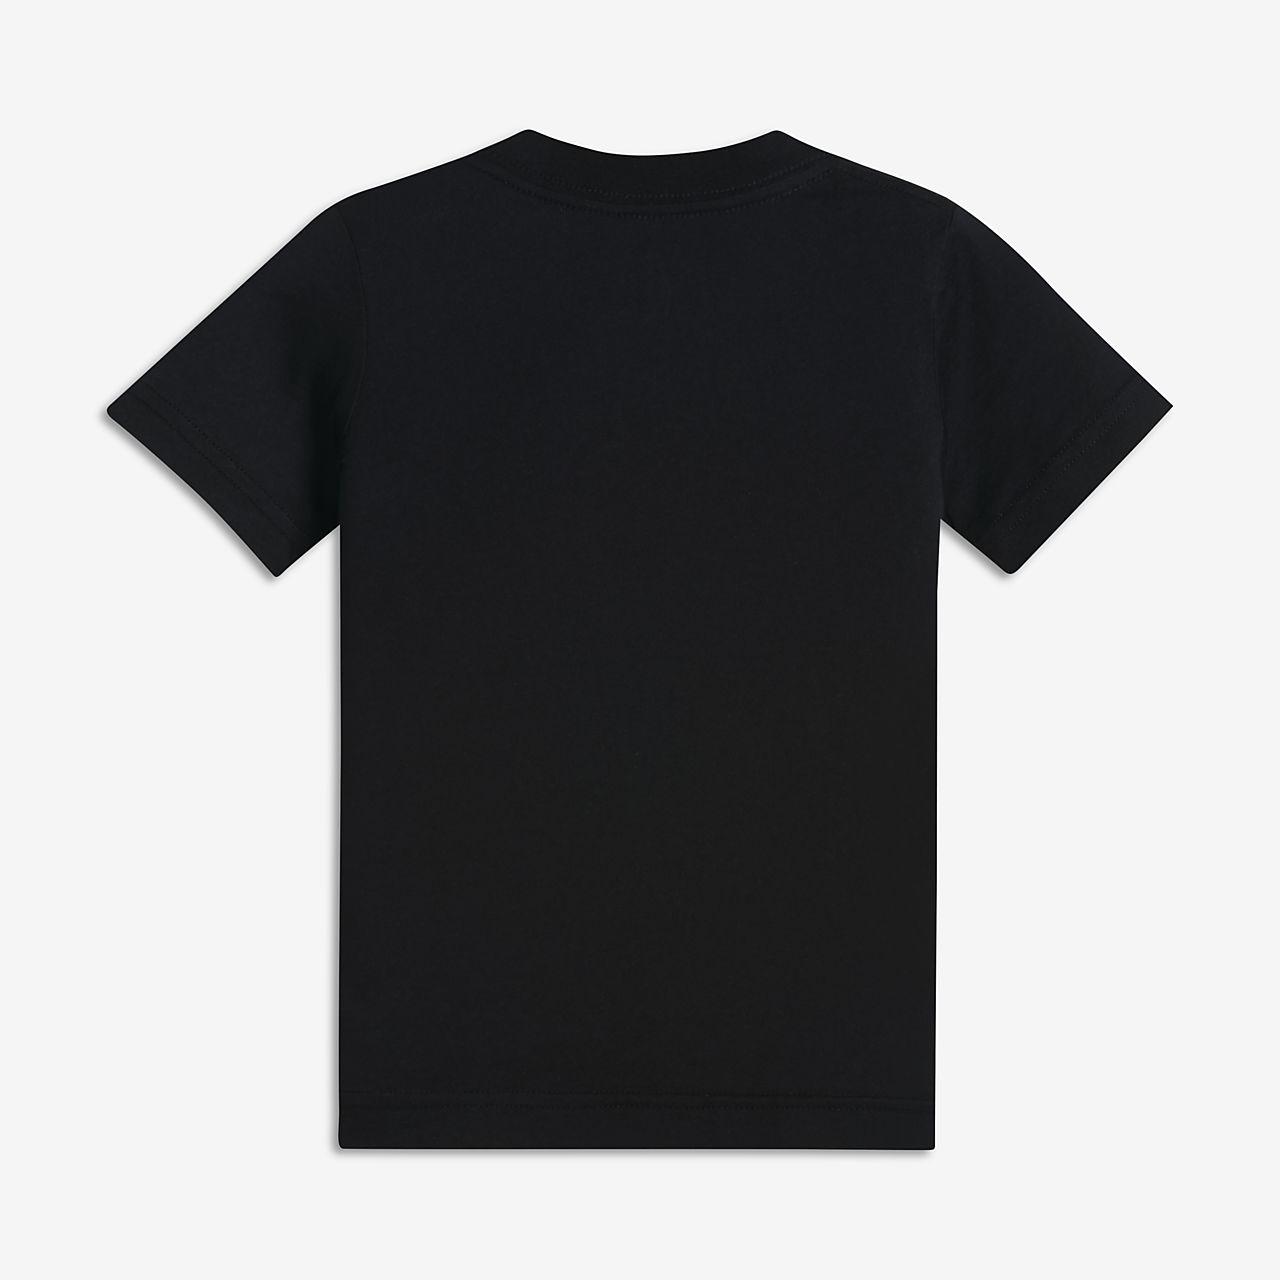 Jordan Sportswear Paris City Younger Kids 39 Boys 39 T Shirt